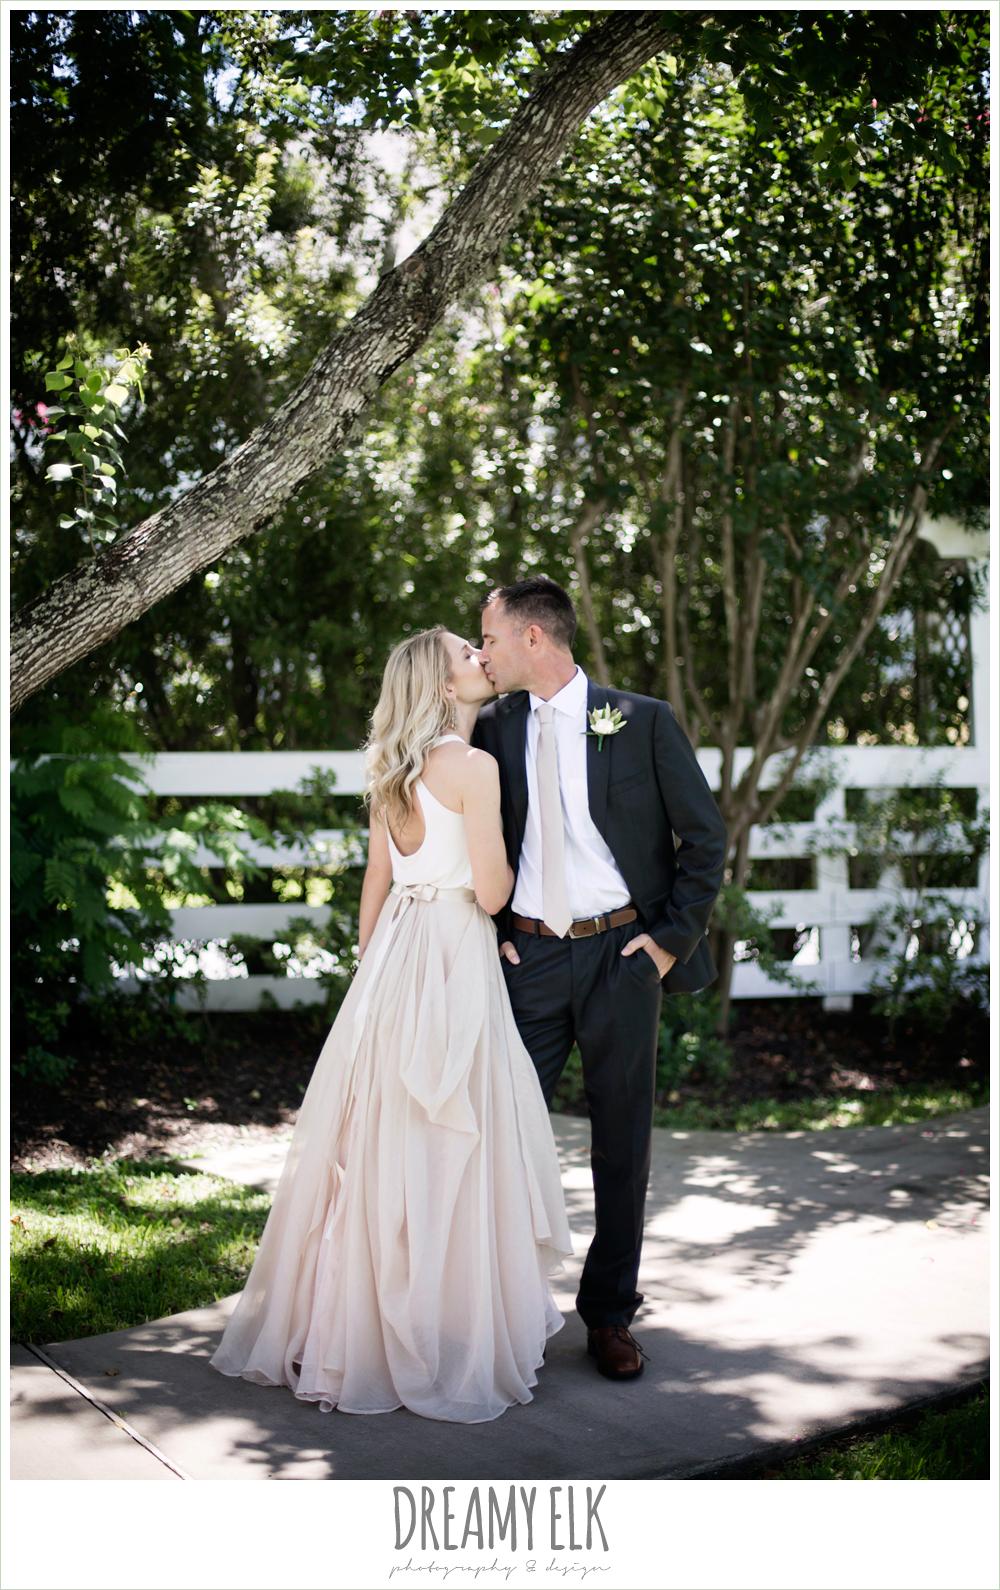 outdoor bride and groom photo, hugo boss groom's suit, southern protocol bridal boutique, carol hannah kensington halter and blush skirt,